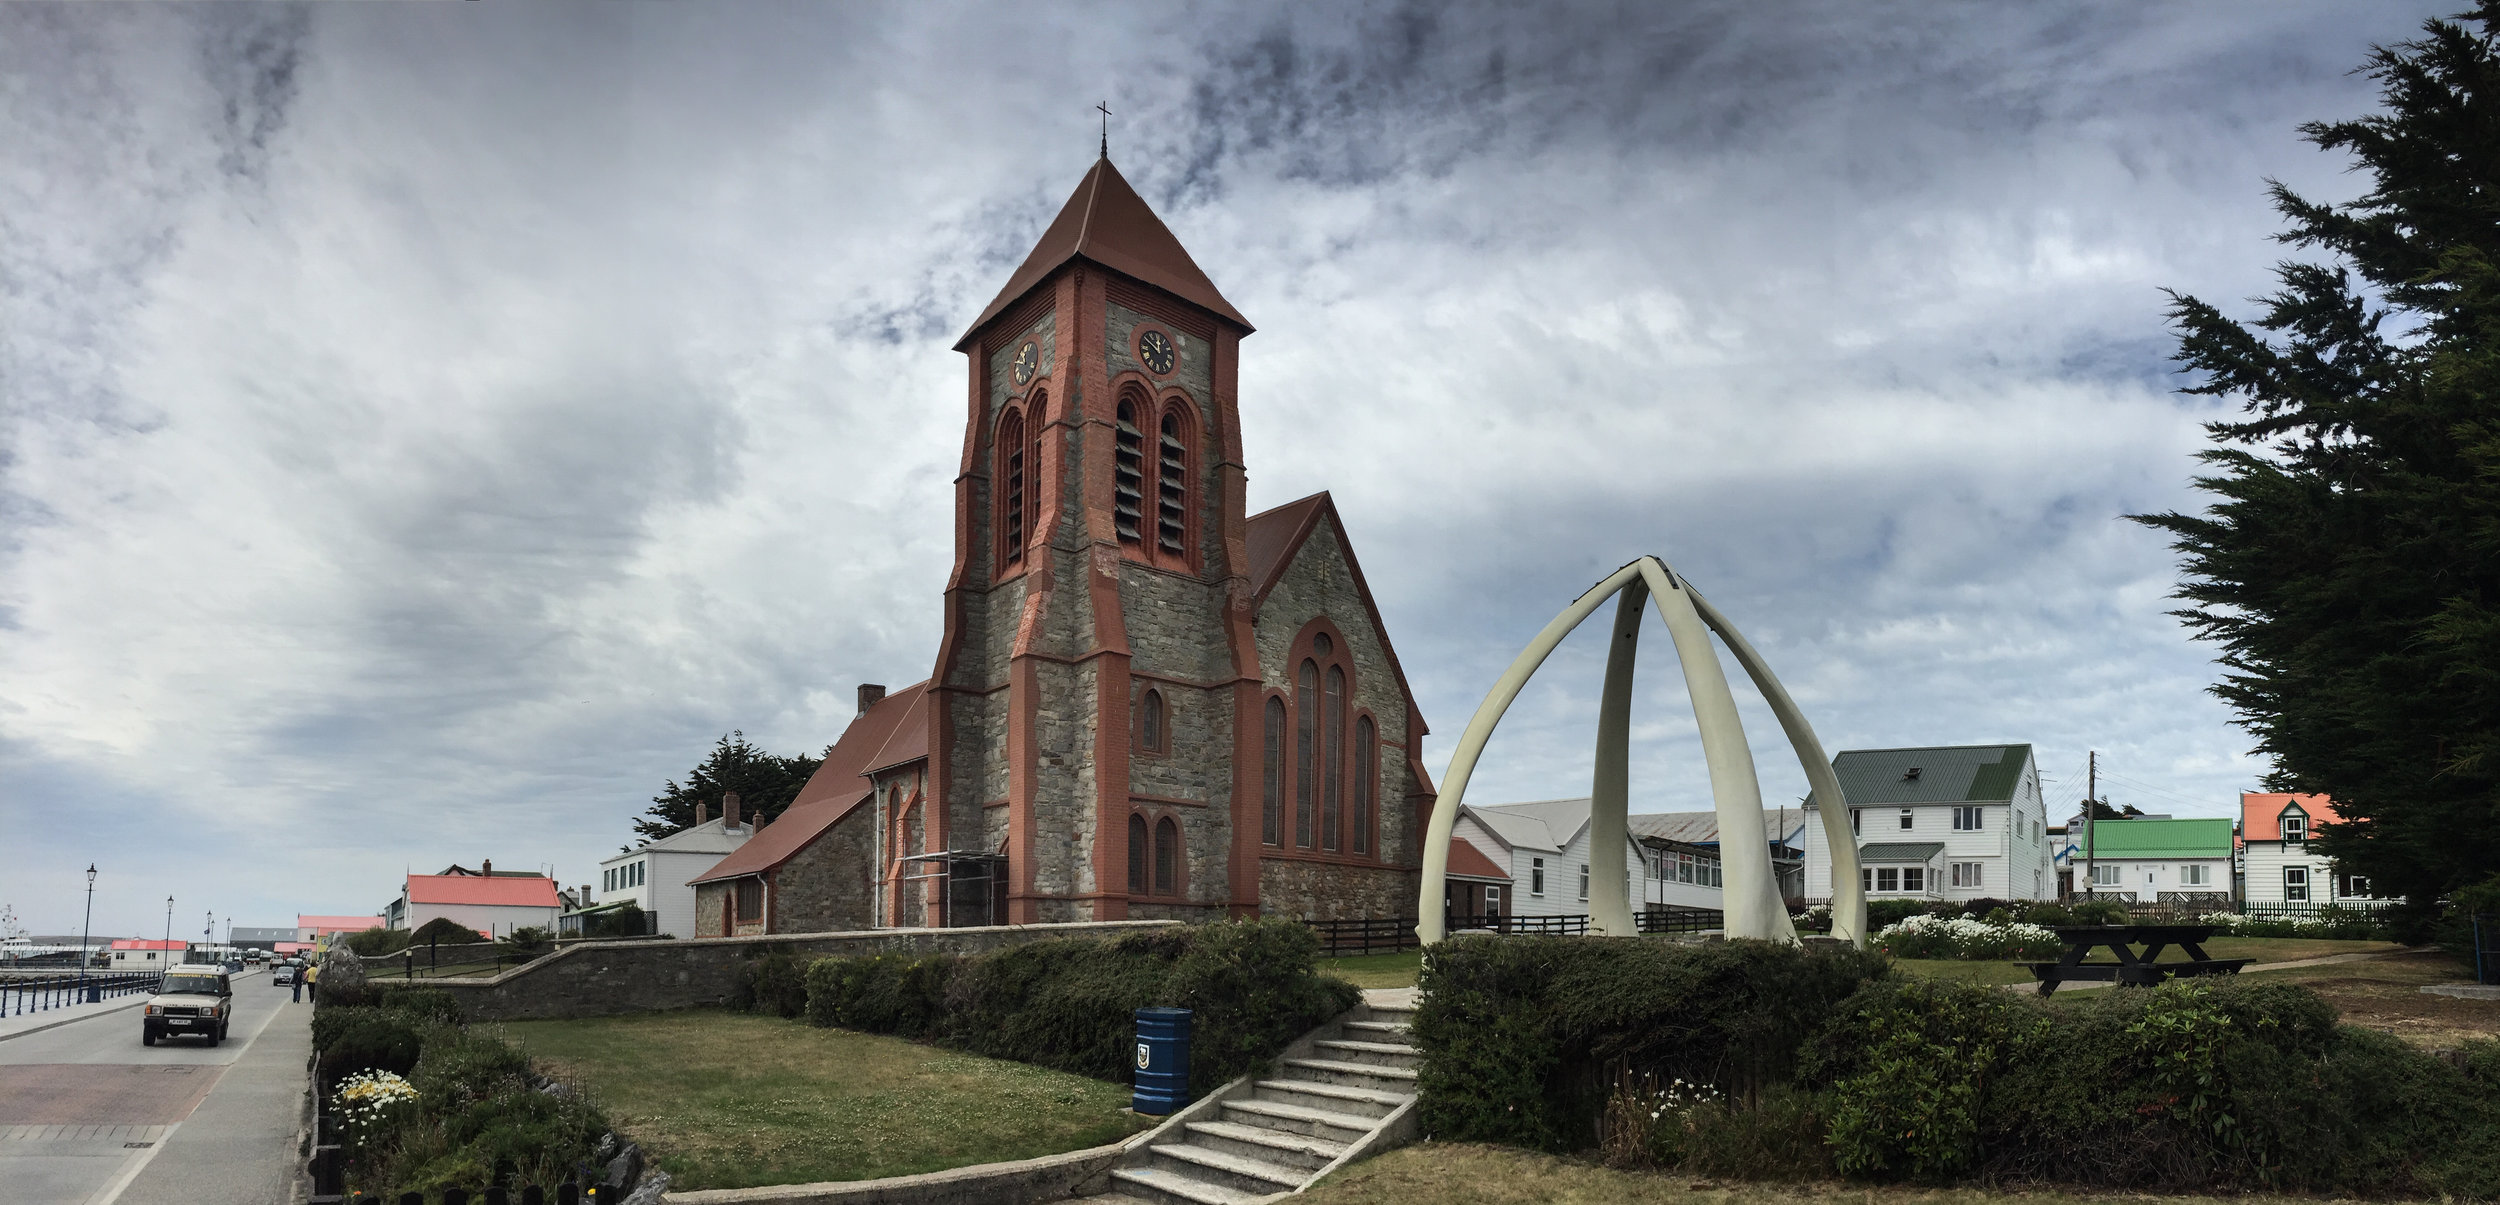 Copy of Port Stanley, Falkland Islands